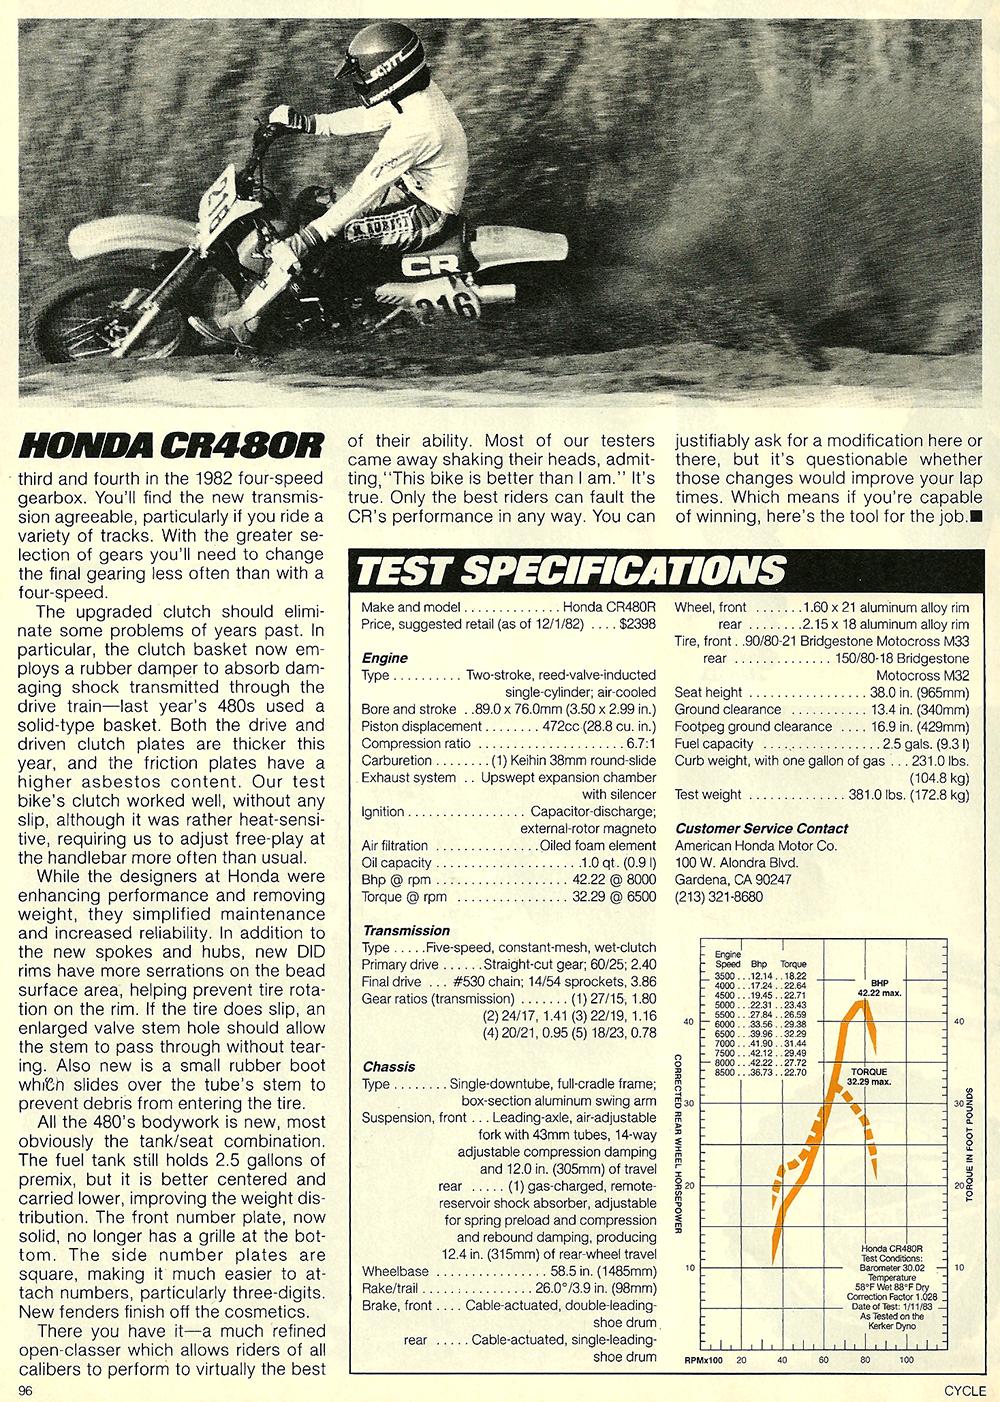 1983 Honda CR480R road test 7.jpg